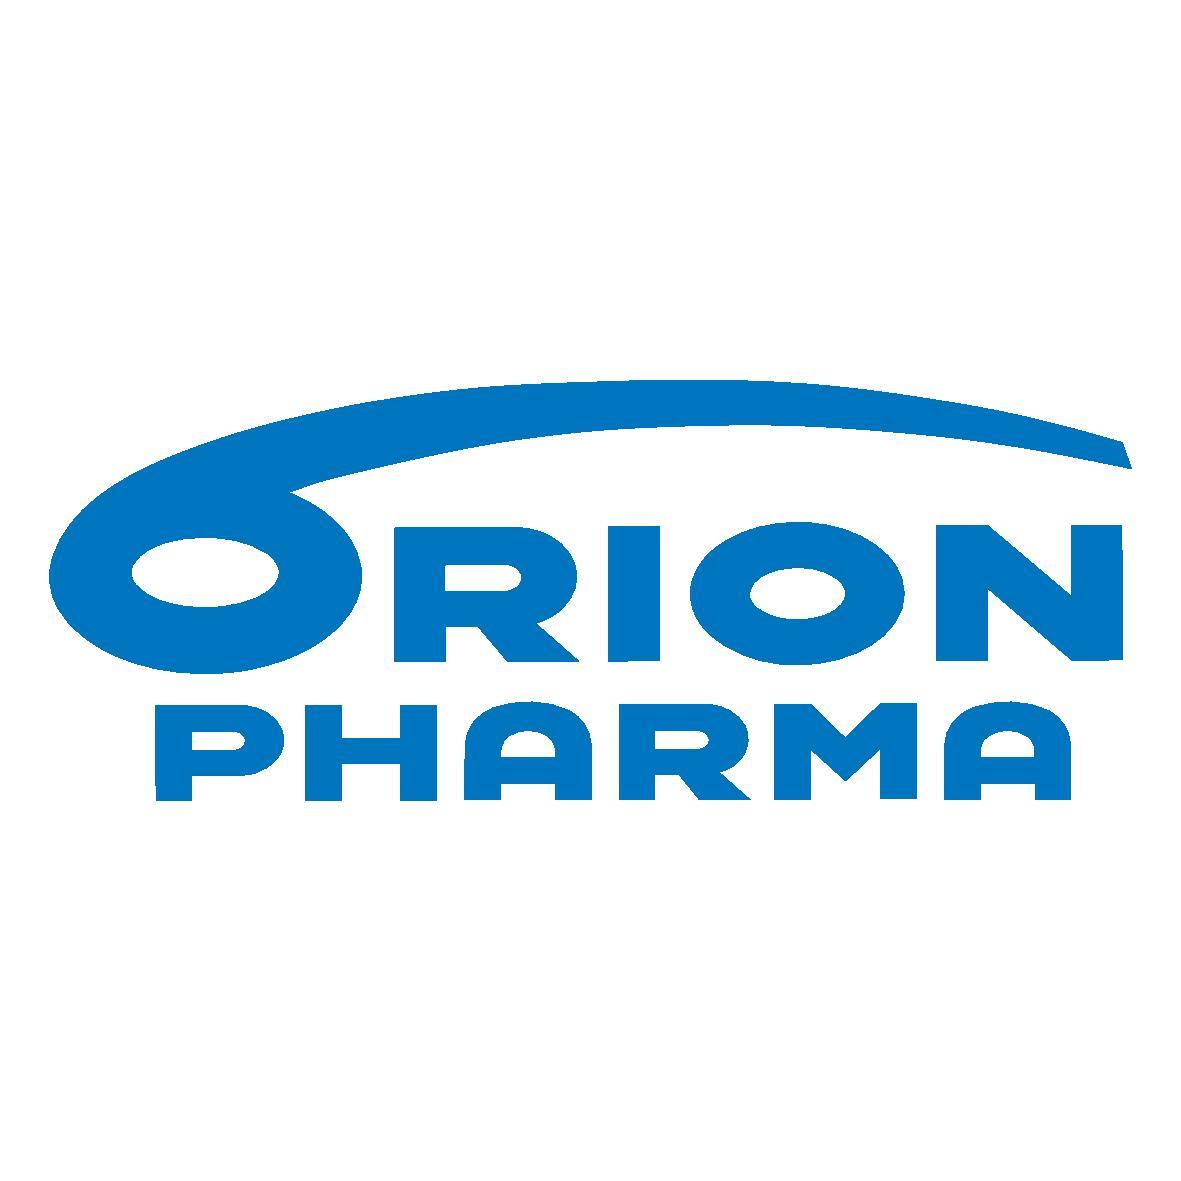 orion pharma 35975 page 001